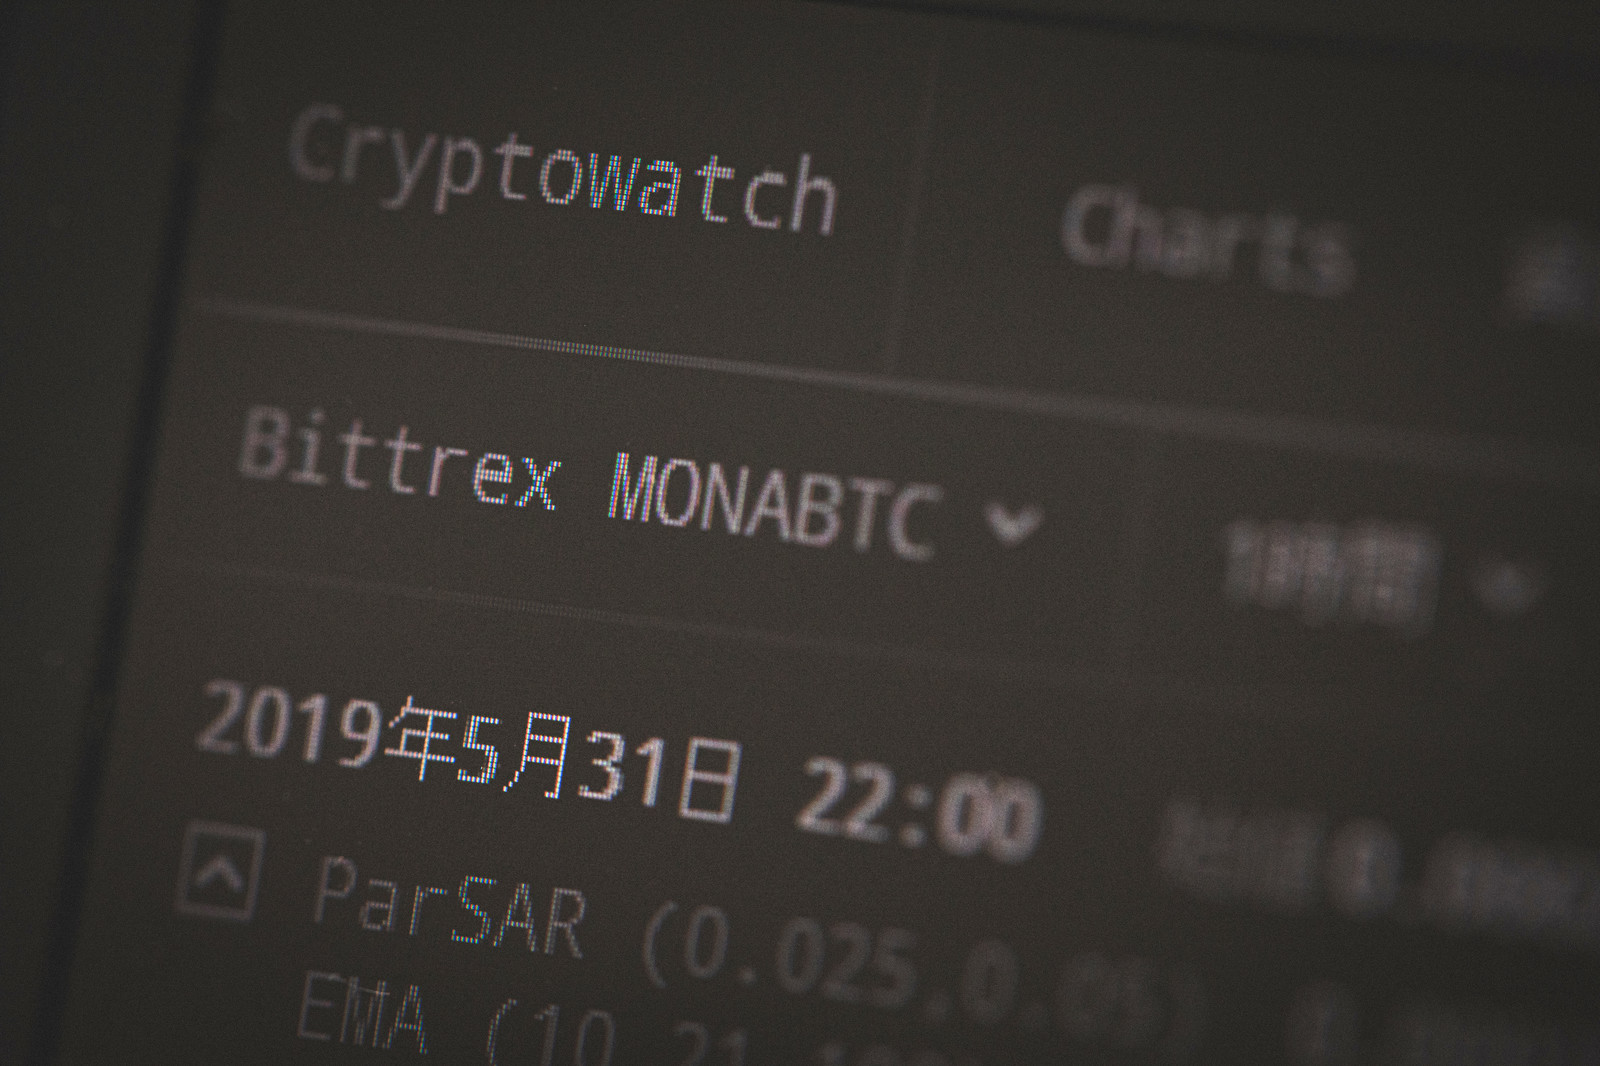 「Cryptowatch で MONABTC を確認」の写真